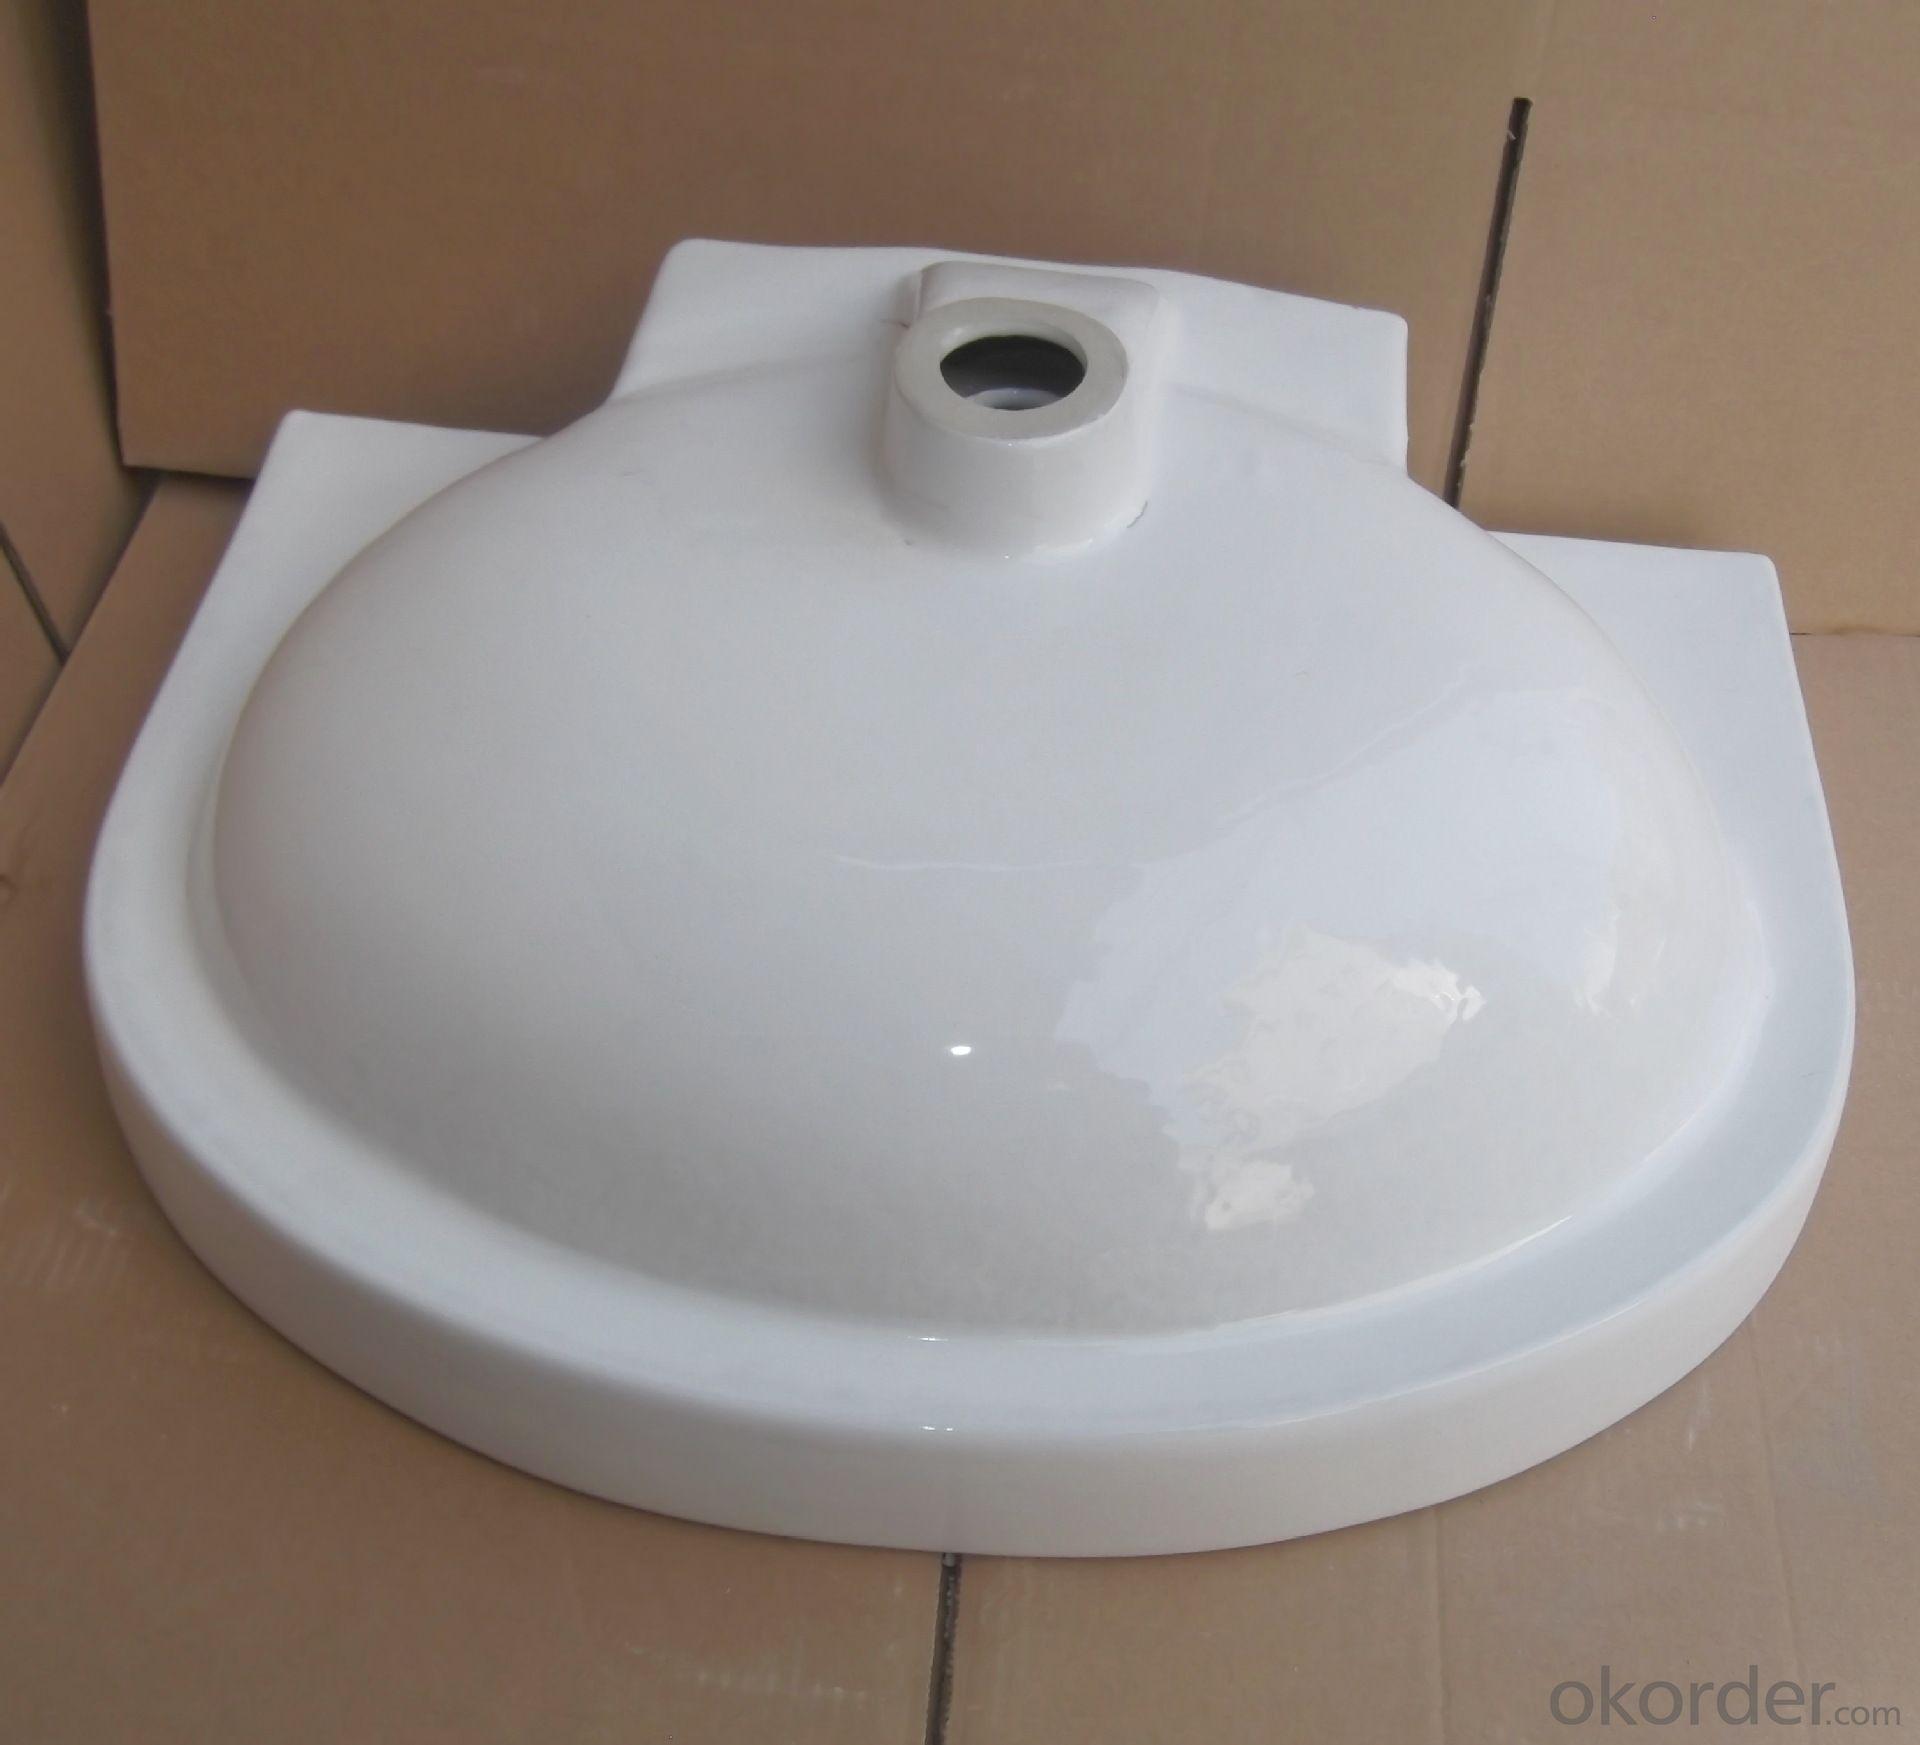 White ceramic stone under counter basin 24-inch